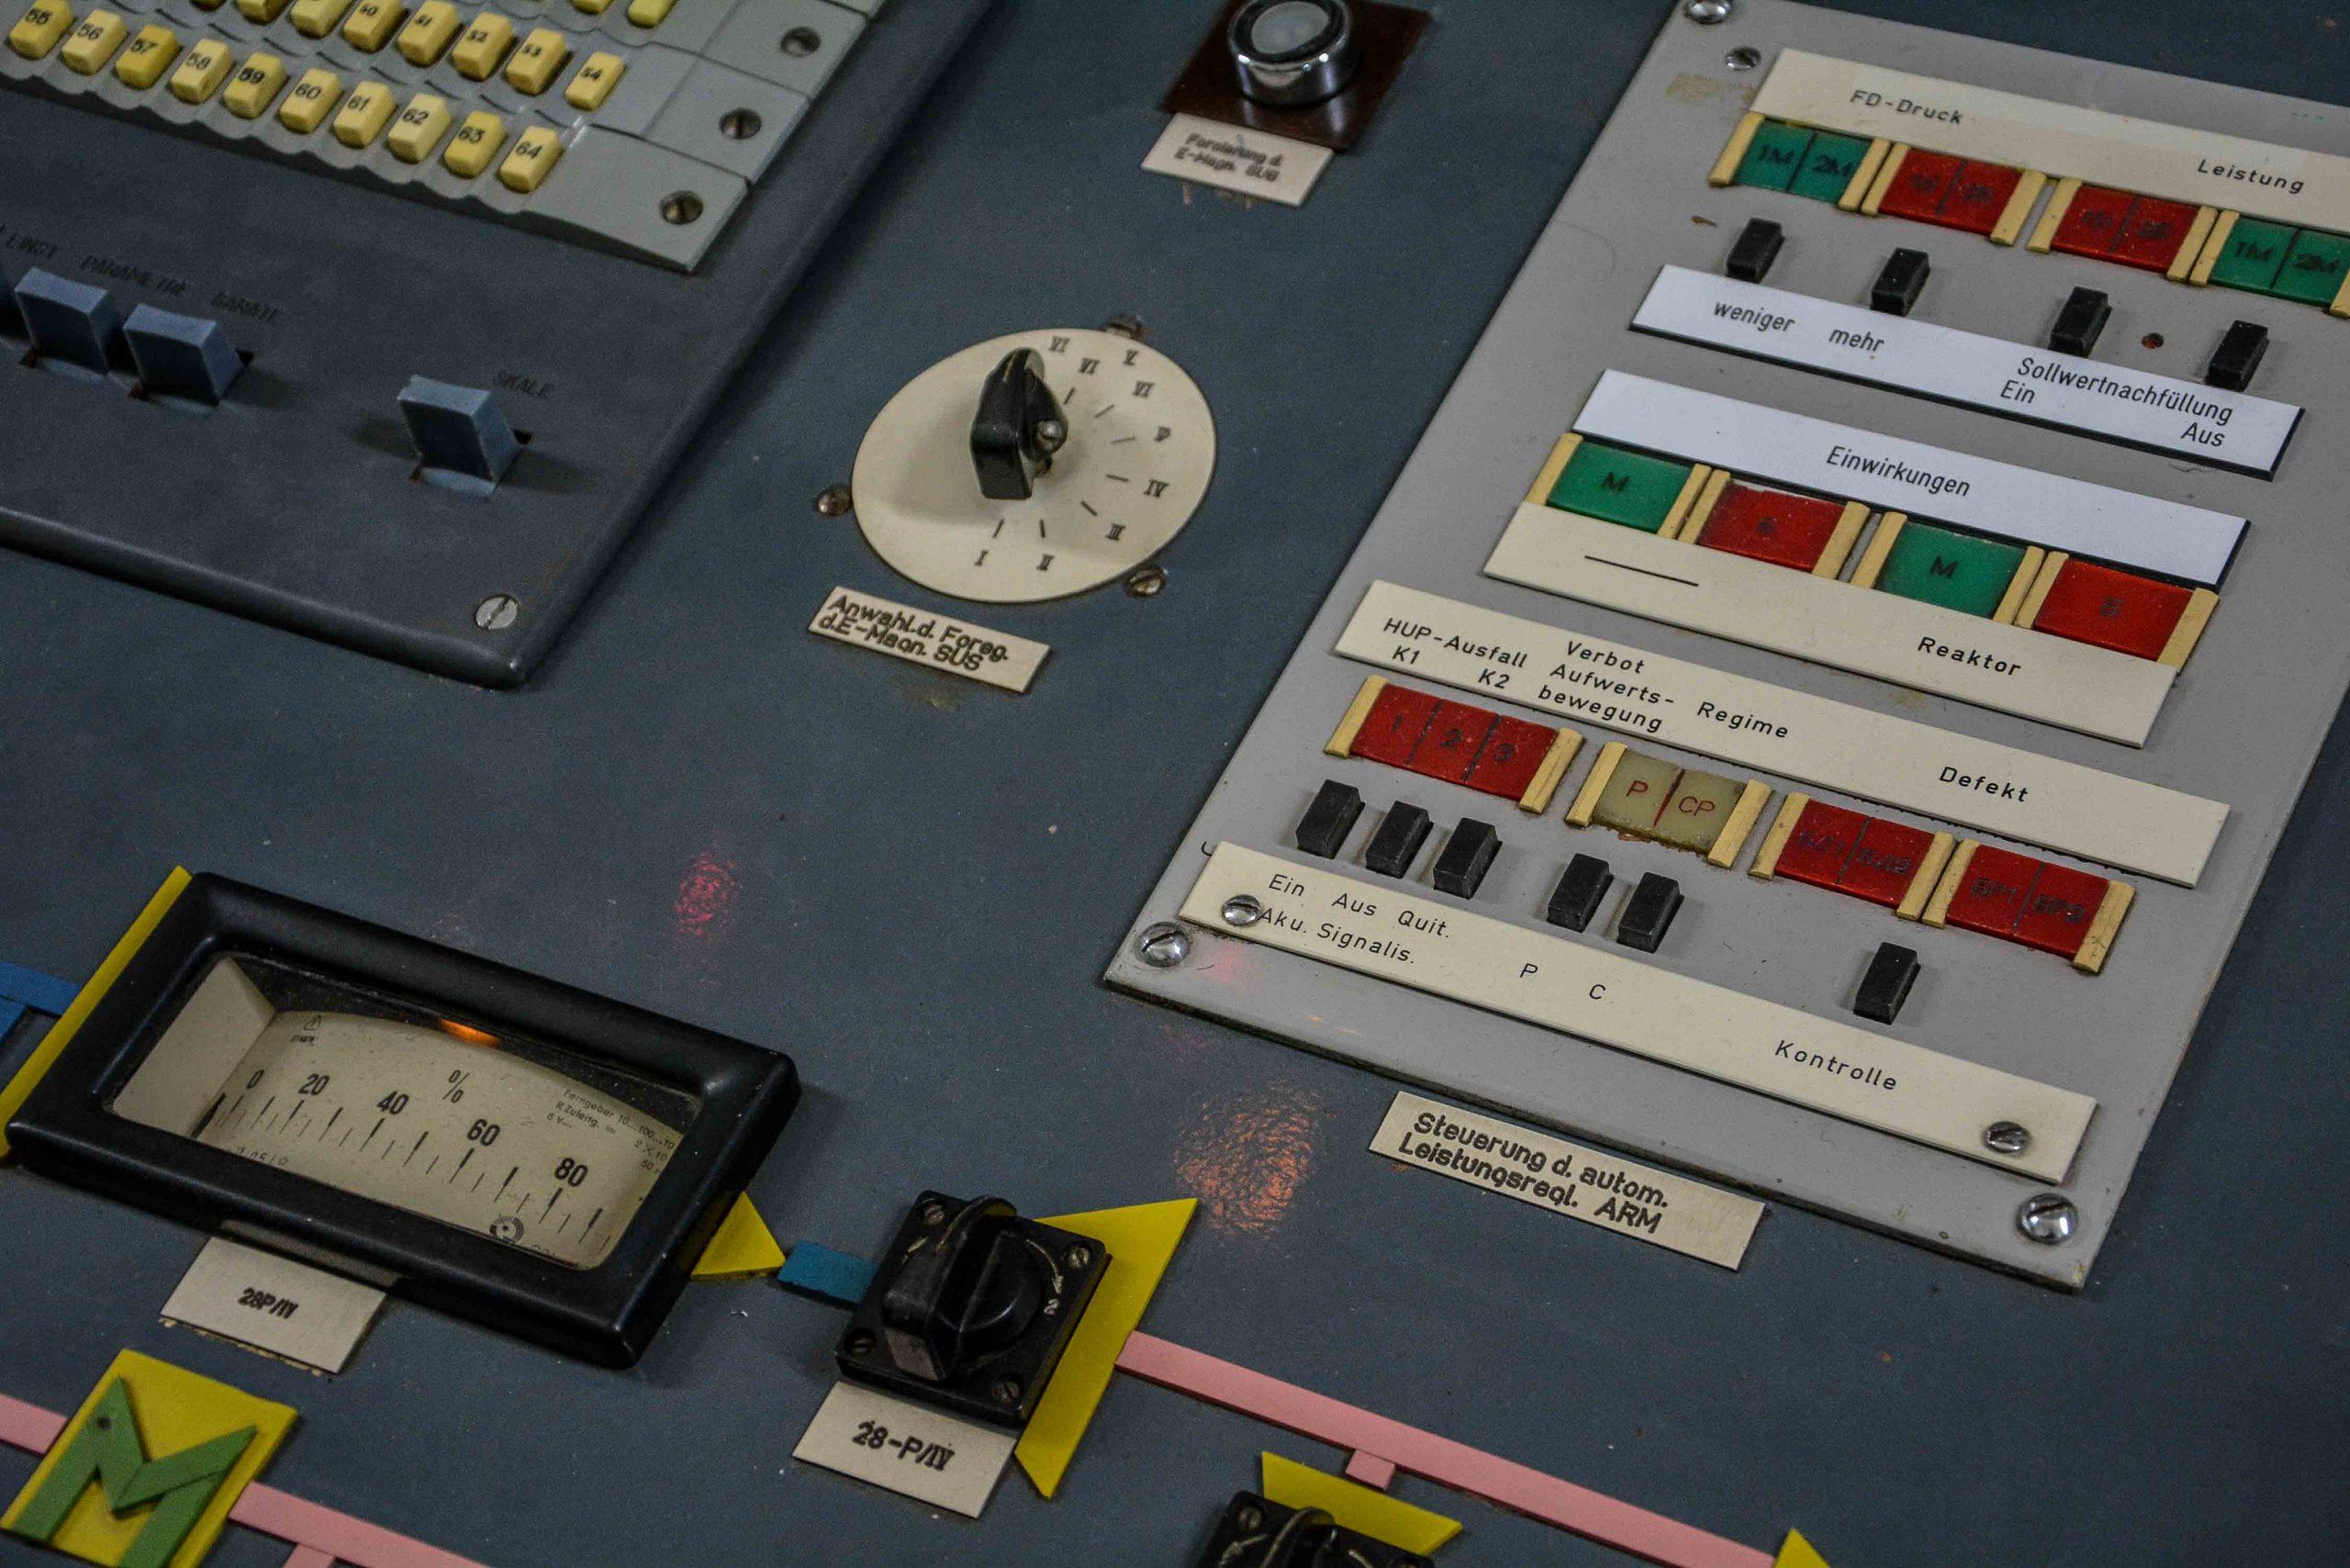 reaktor pult knoepfe kernkraftwerk greifswald nuclear powerplant ost deutschland east germany gdr DDR mecklenburg vorpommern